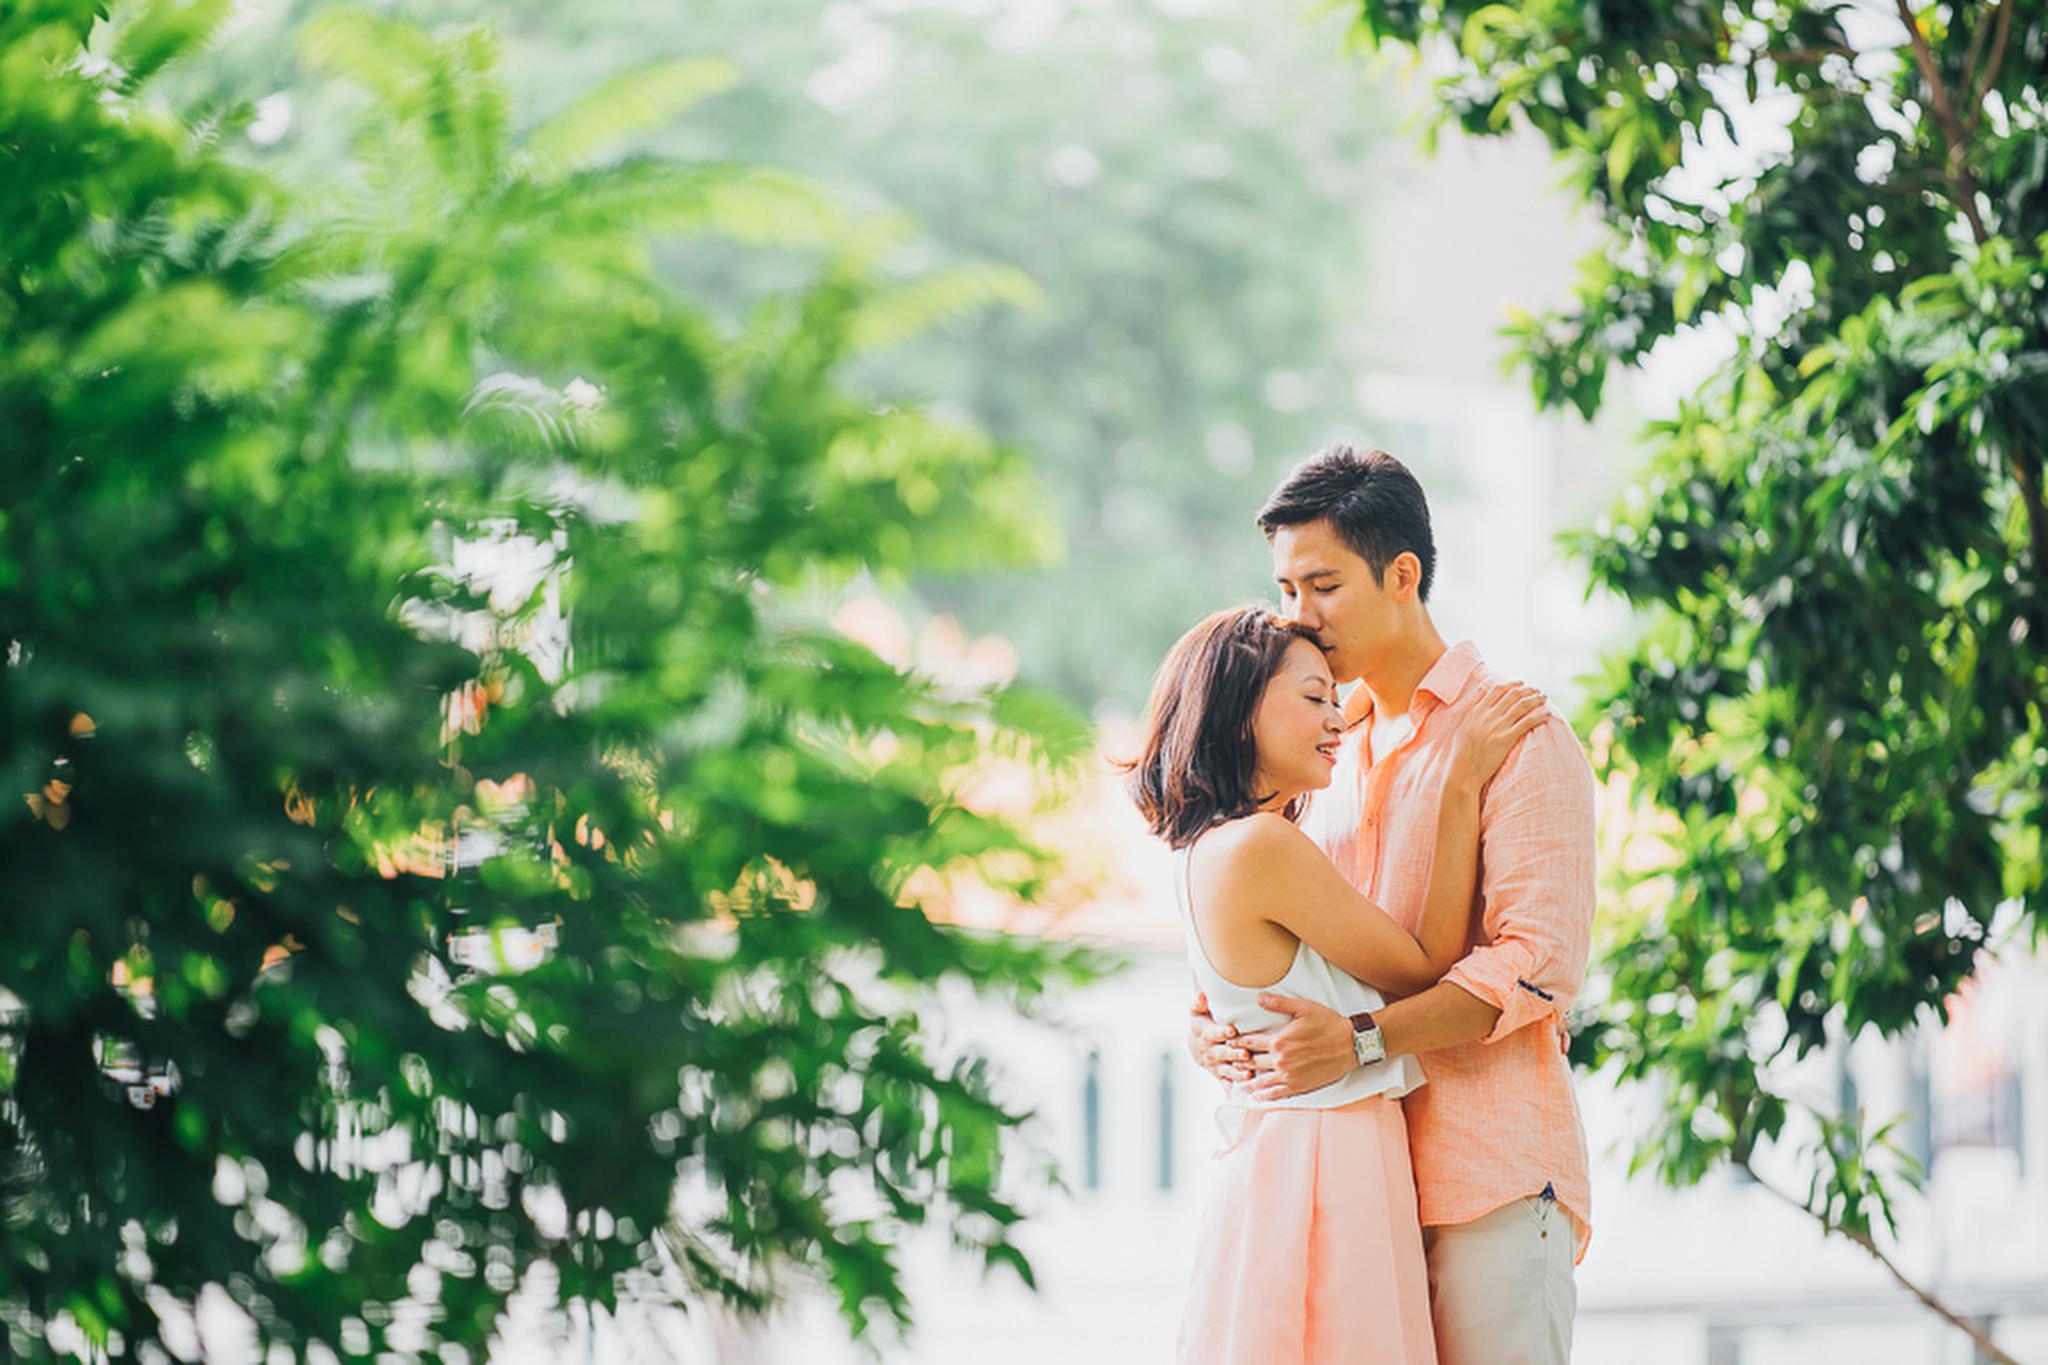 Singapore Wedding Photographer - Weisheng & Justina (6 of 47).JPG